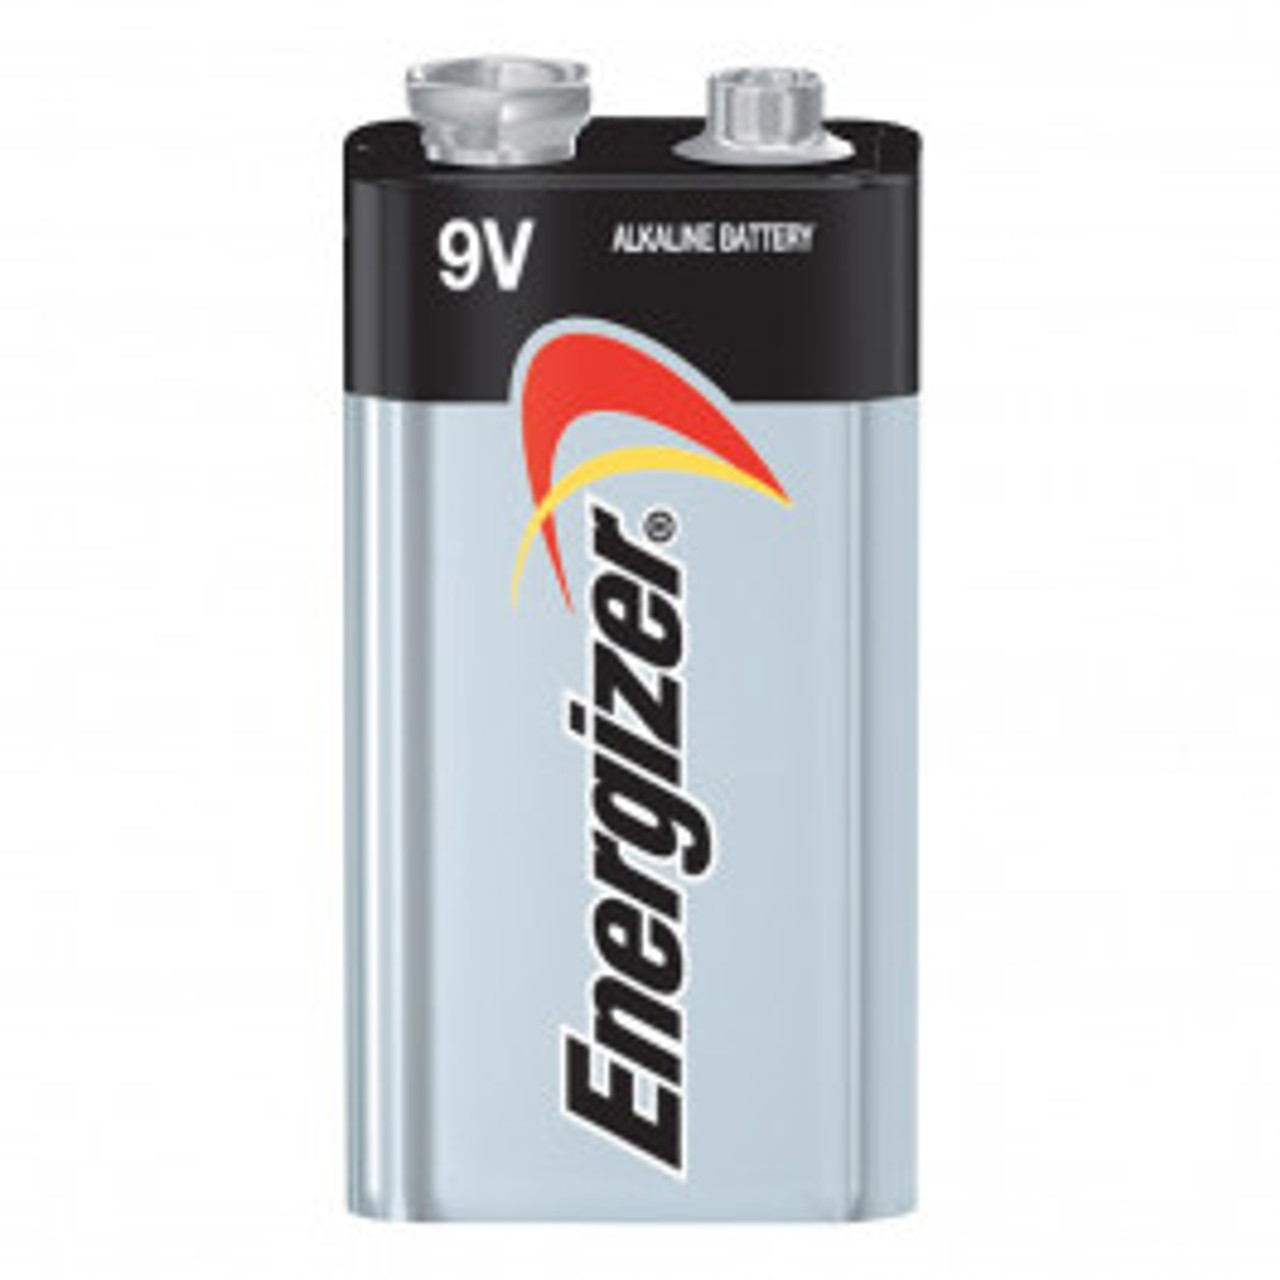 9 Volt Alkaline Battery  - 1 Pack